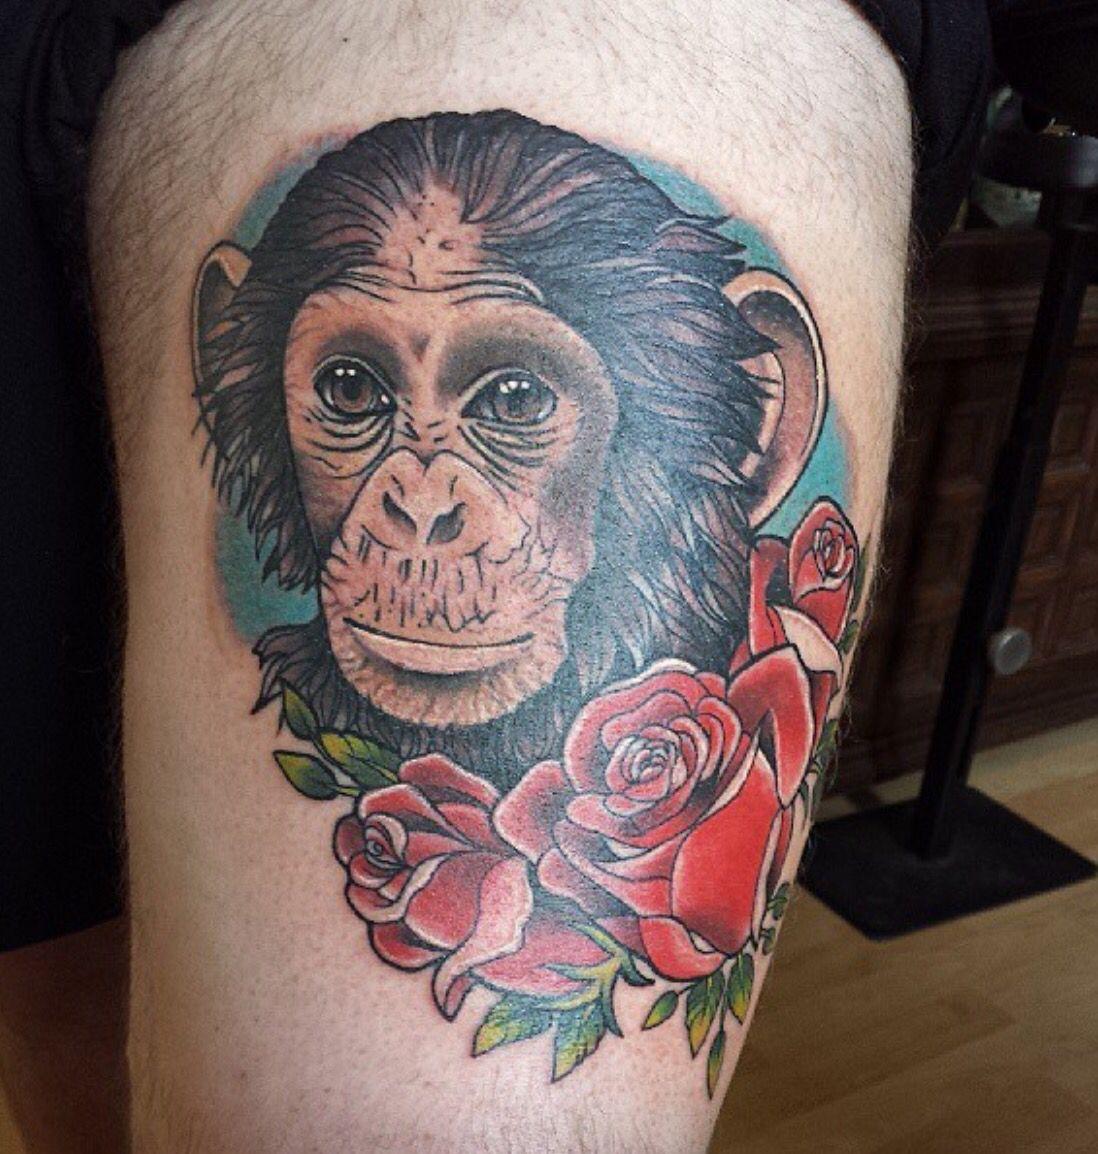 monkey tattoo | monkey tattoos ideas | pinterest | monkey tattoos